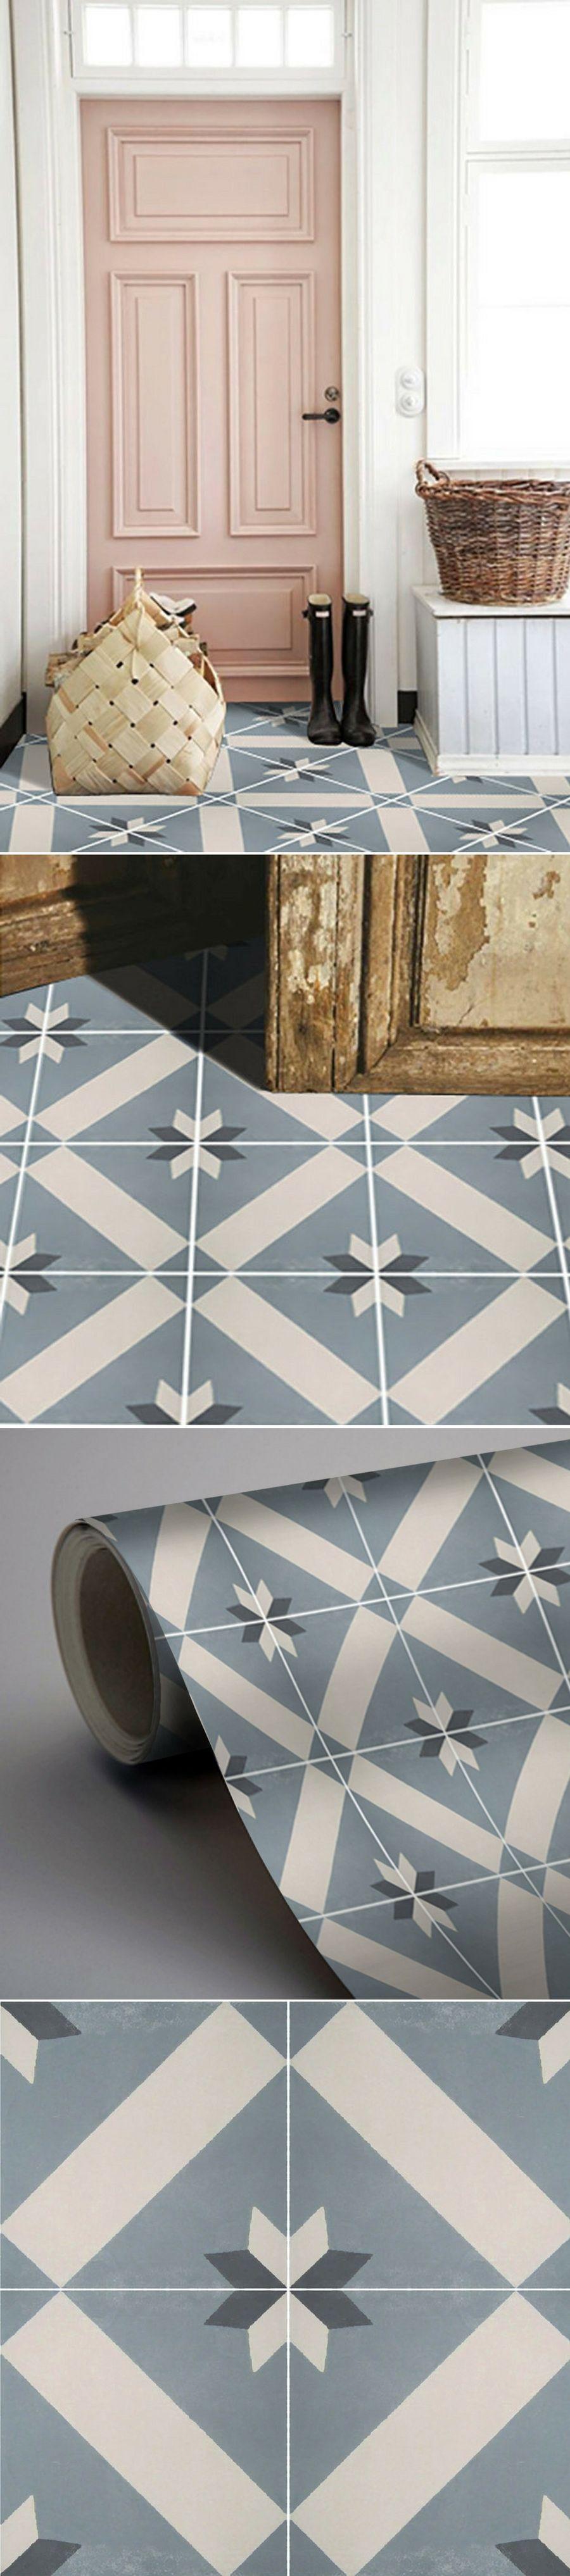 carrelage adh sif imitation carreaux de ciment on the. Black Bedroom Furniture Sets. Home Design Ideas